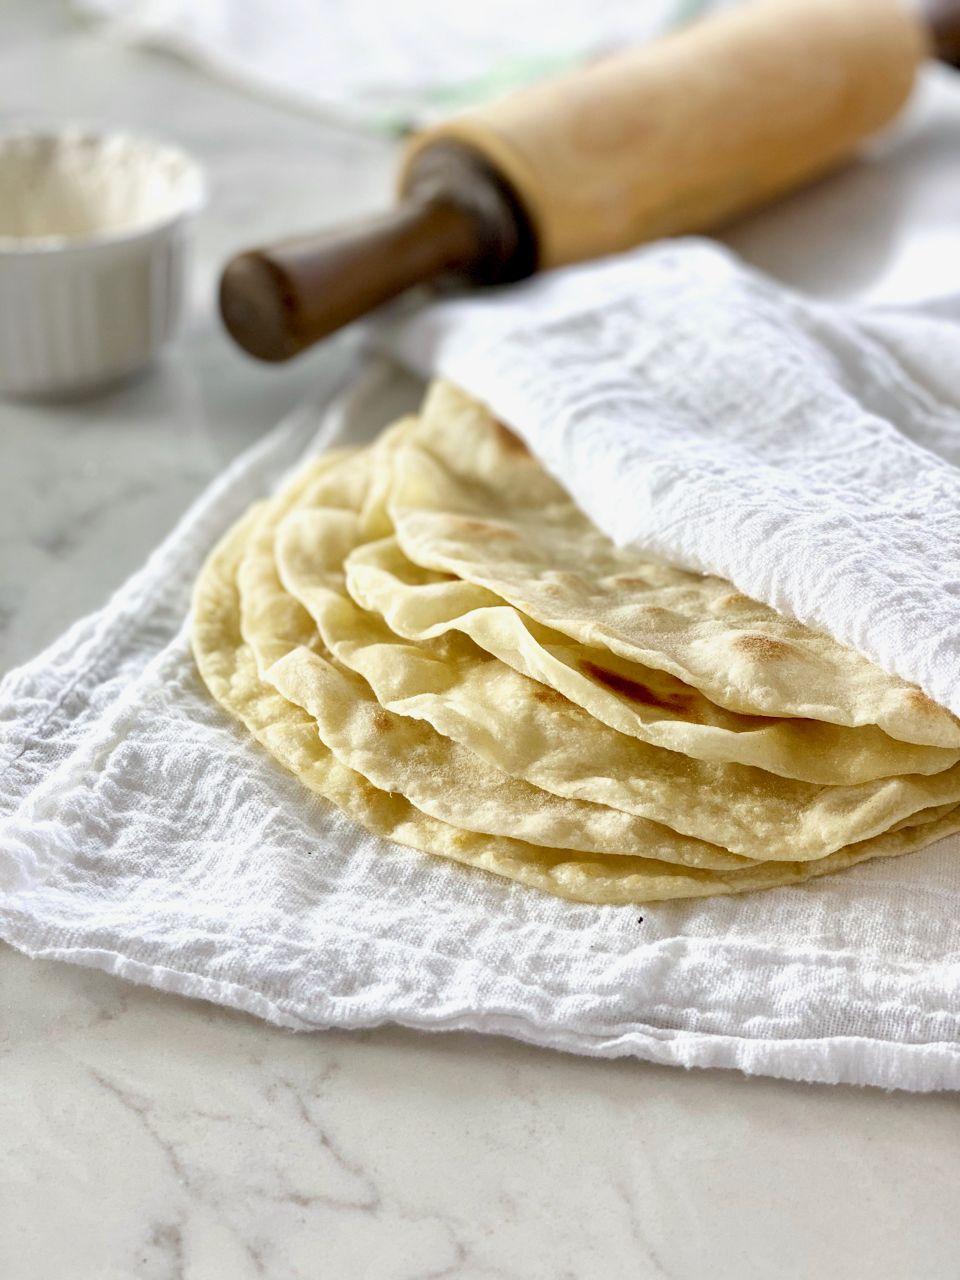 Authentic flour tortilla recipe how to make homemade